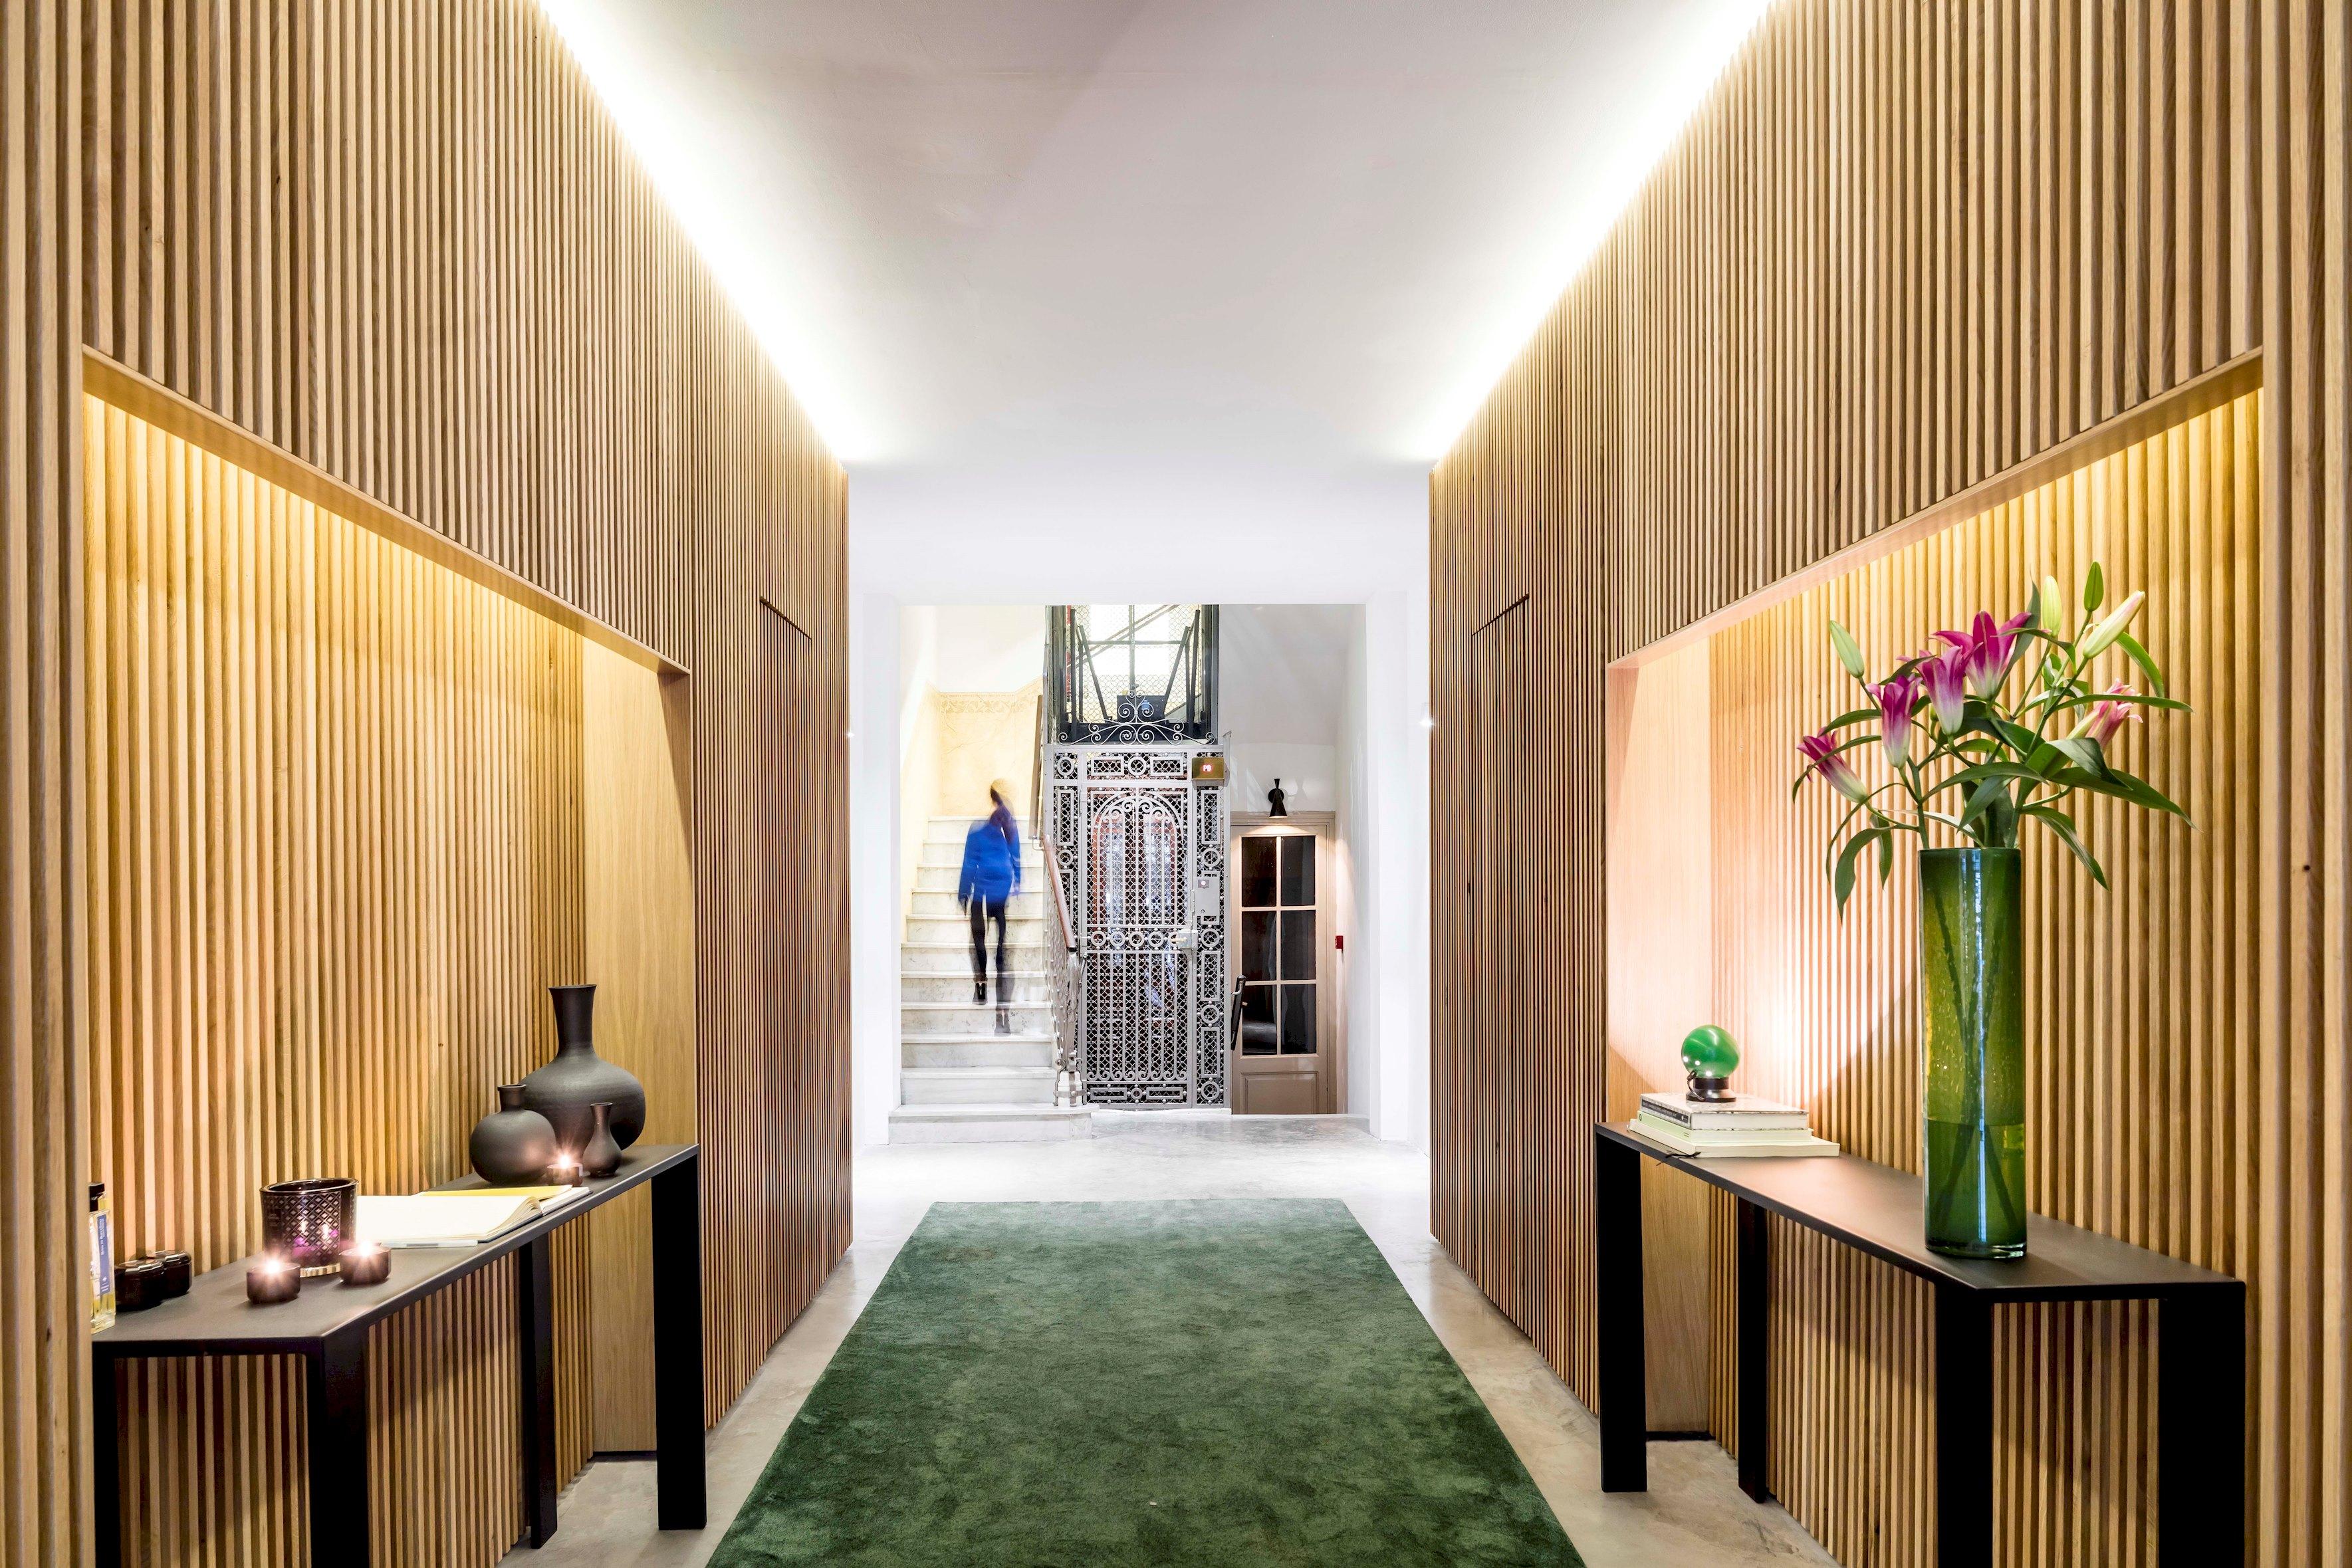 Apartment Luxury Apartment 2 bedrooms Loft 1 photo 23407512